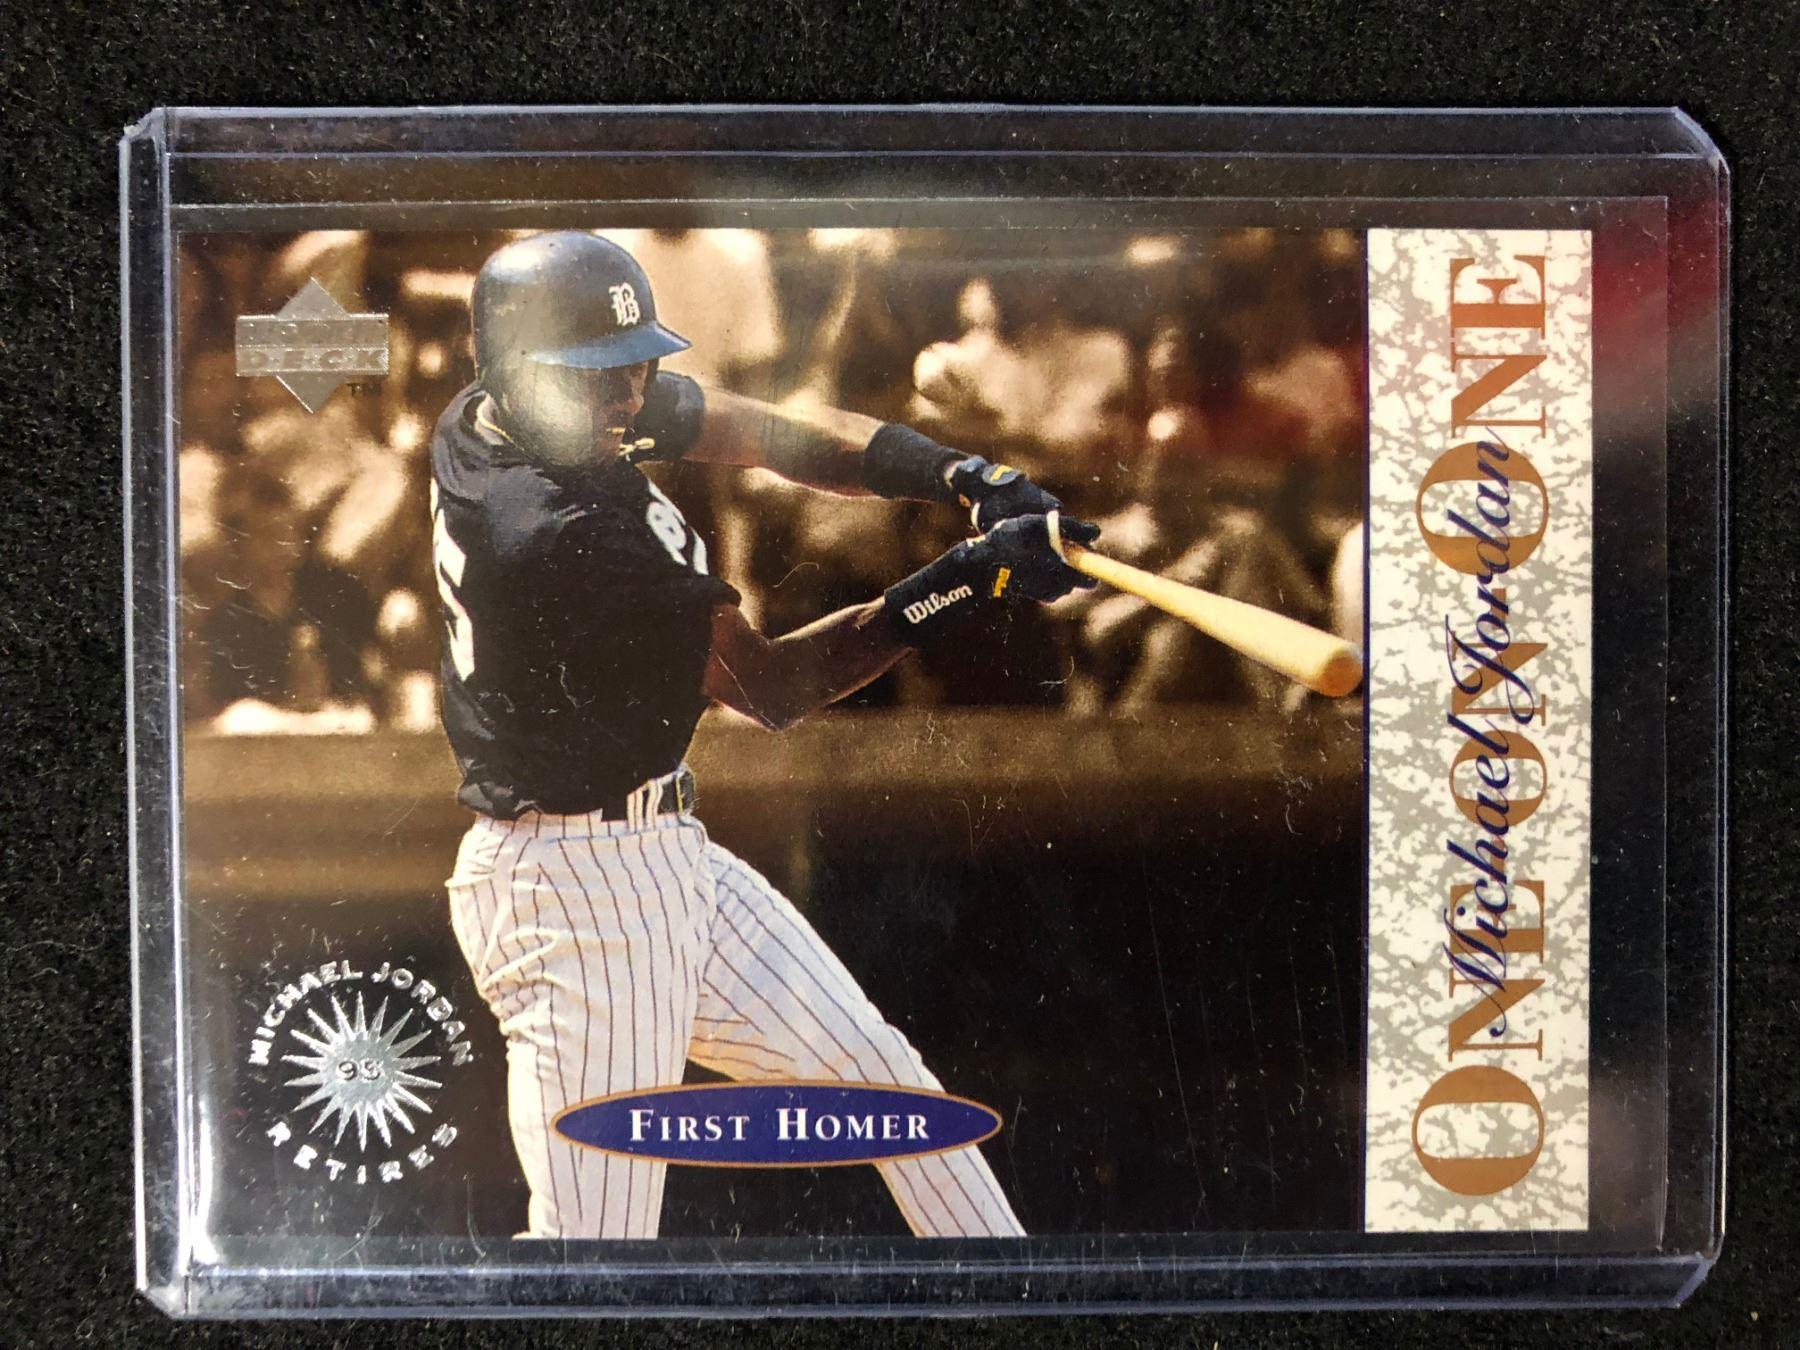 Upper Deck First Homer One On One Michael Jordan Baseball Card